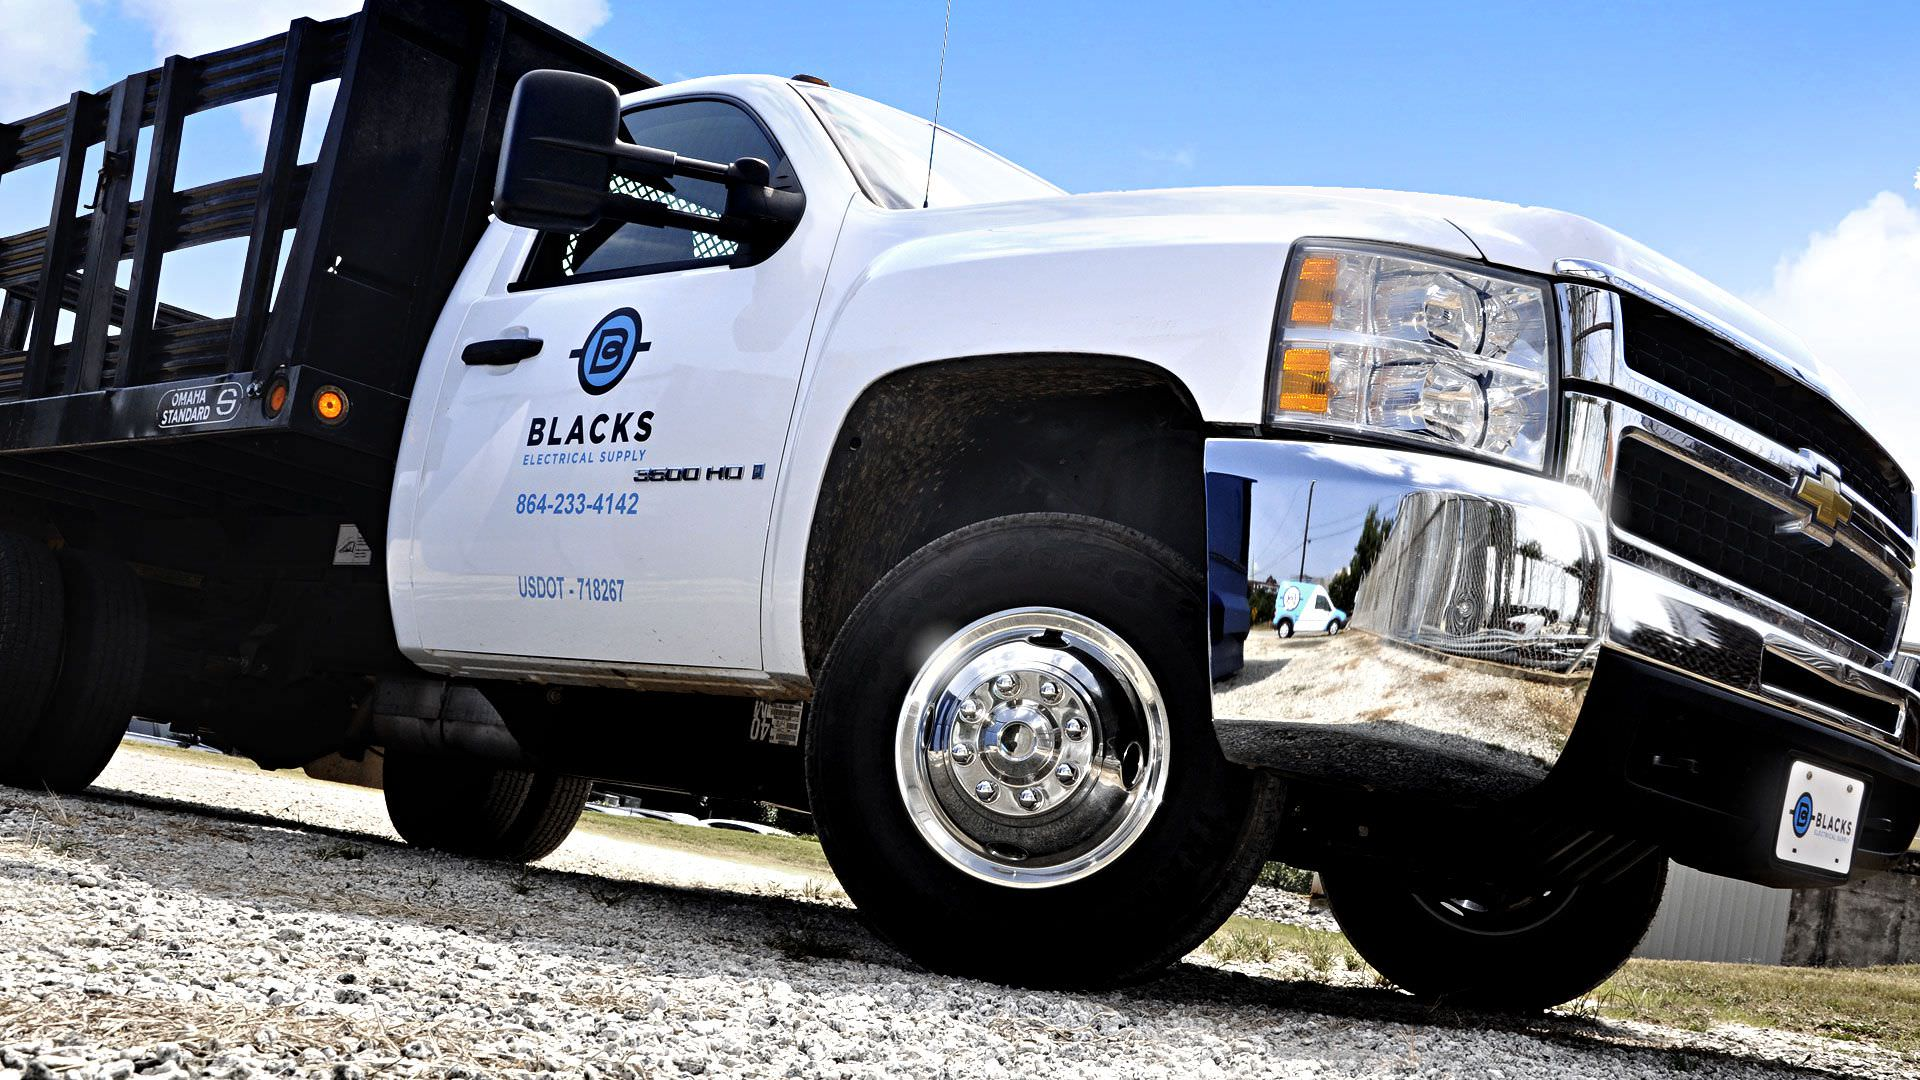 Blacks Electrical Supply - Utility Truck